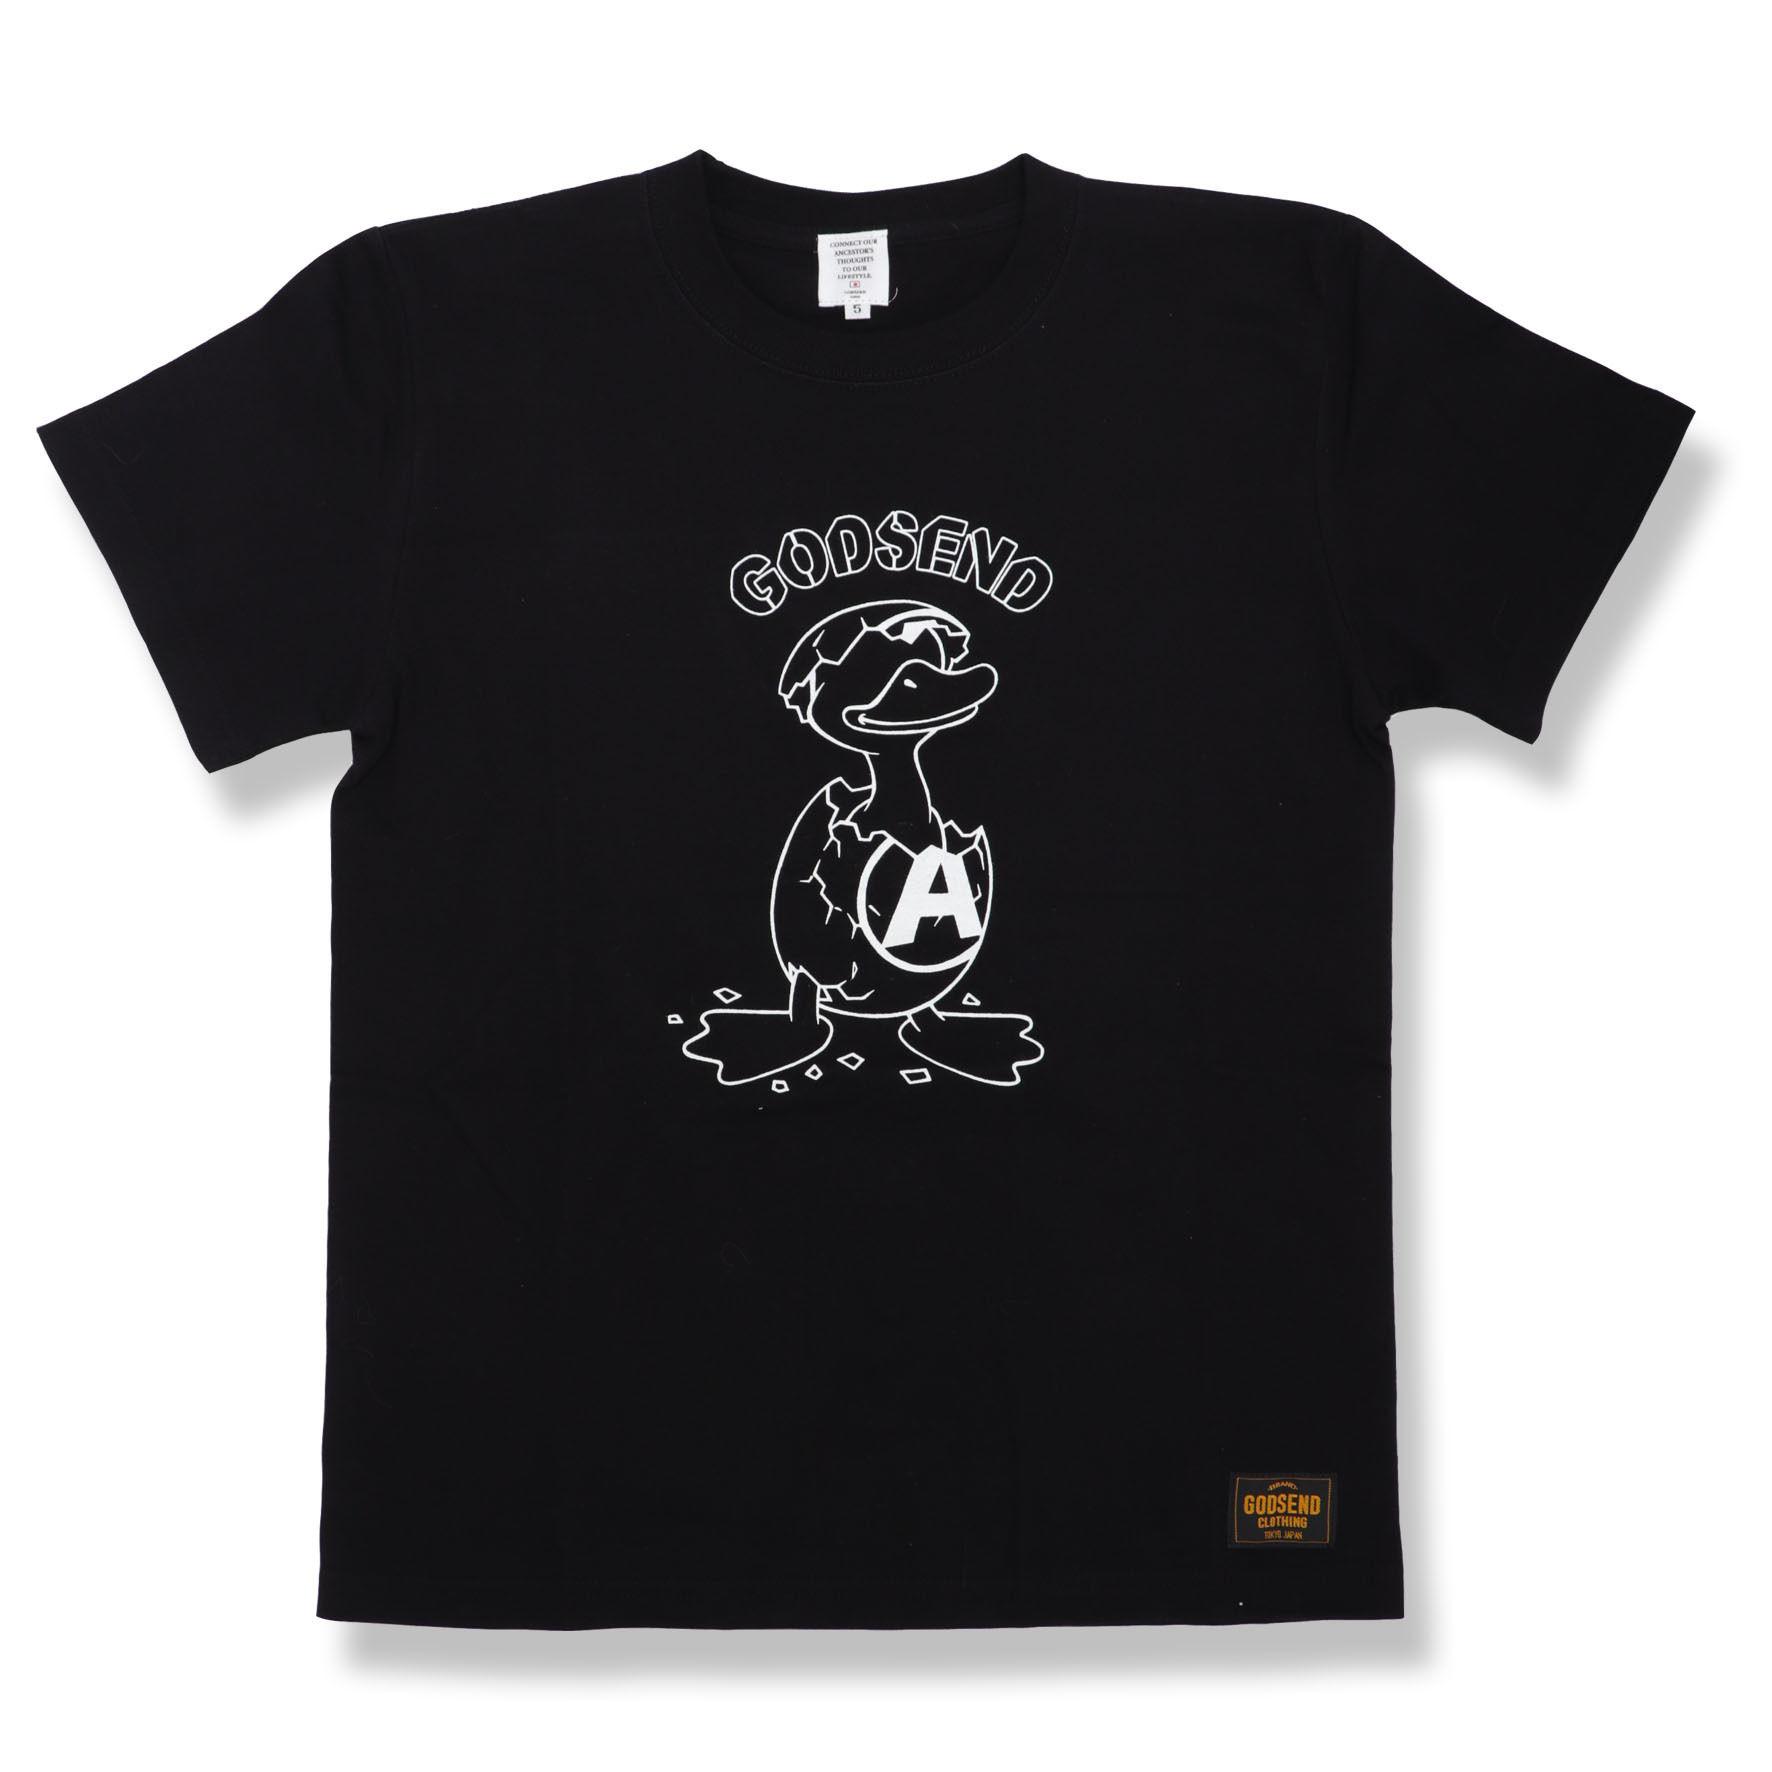 ANARCHY  DUCK  T-Shirts  ADULT  アナーキーダックTee  大人サイズ